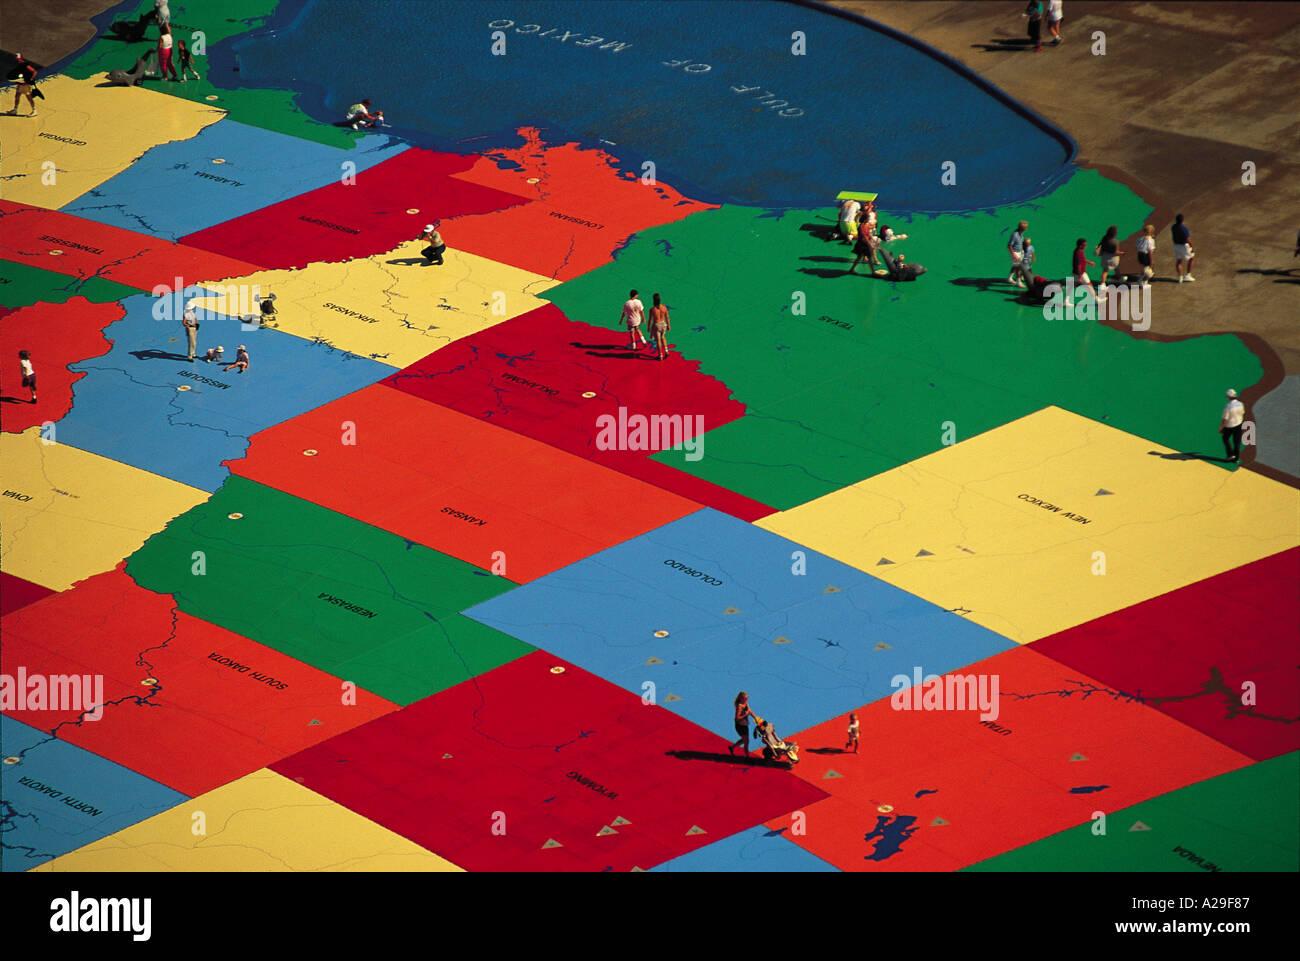 Huge US Map Sea World San Diego California USA S Grandadam Stock - San diego on us map